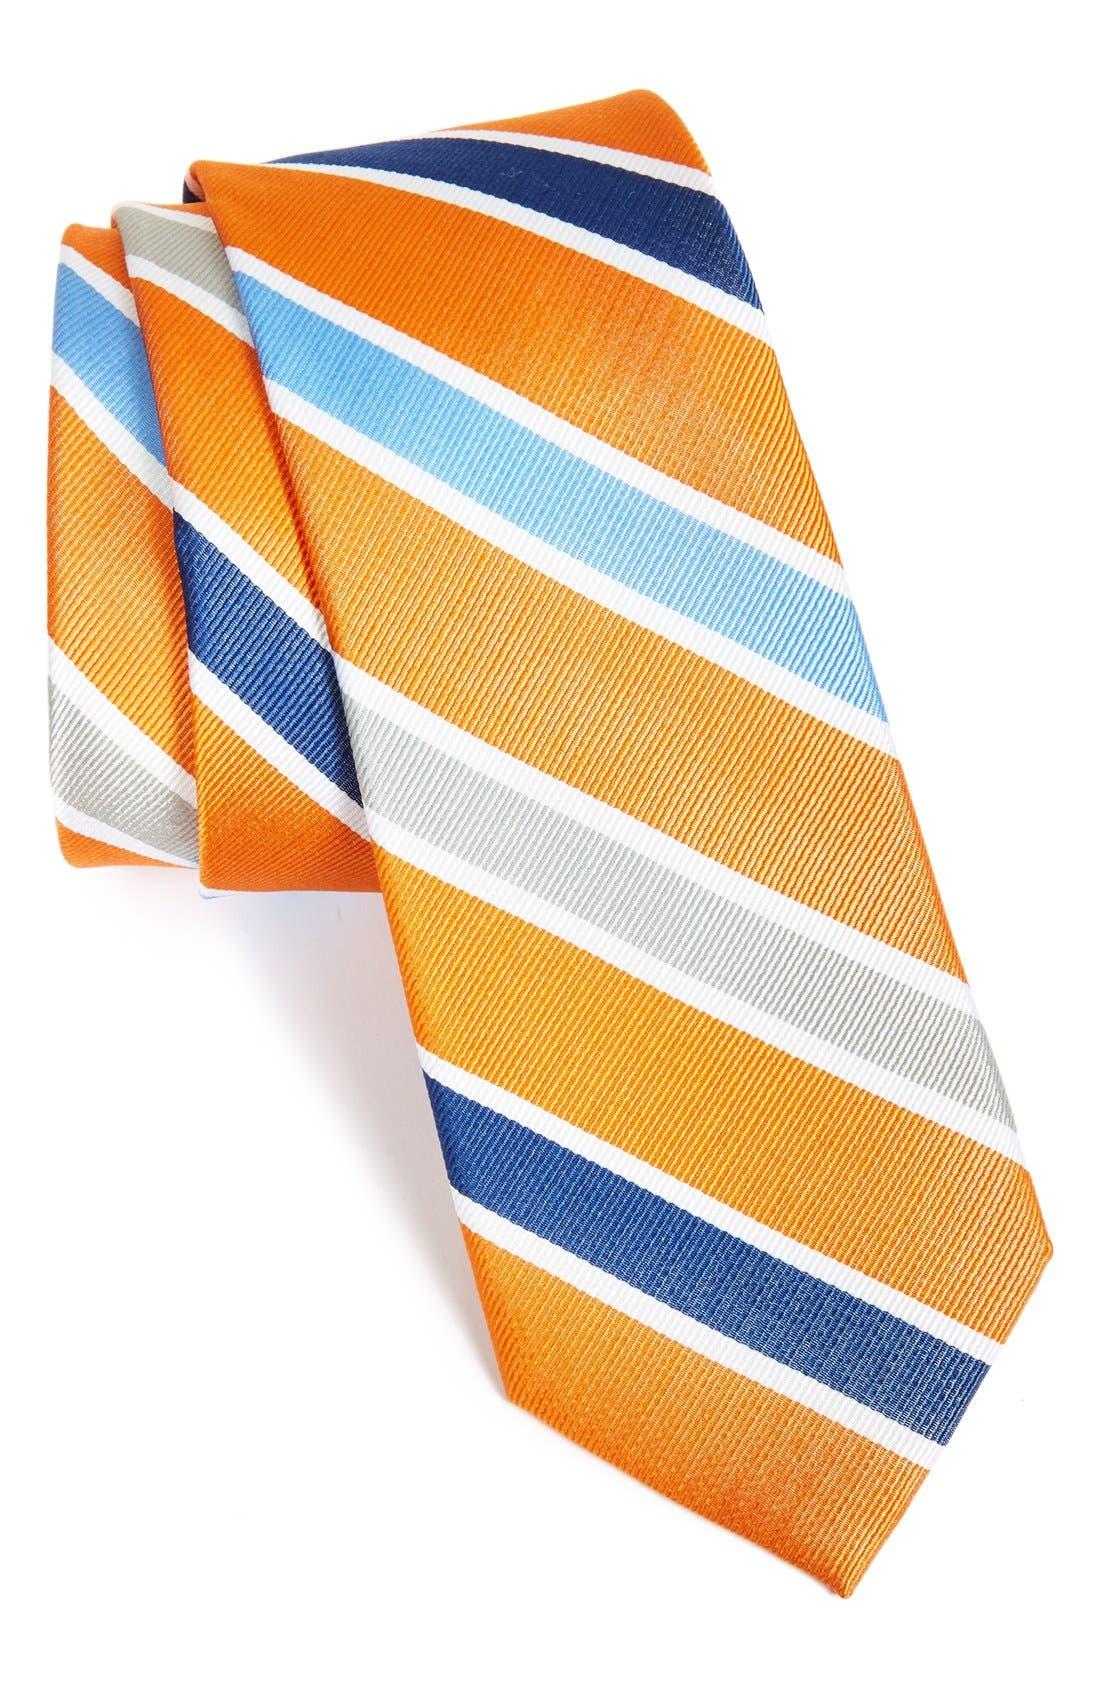 Alternate Image 1 Selected - 1901 'Como Stripe' Woven Silk Tie